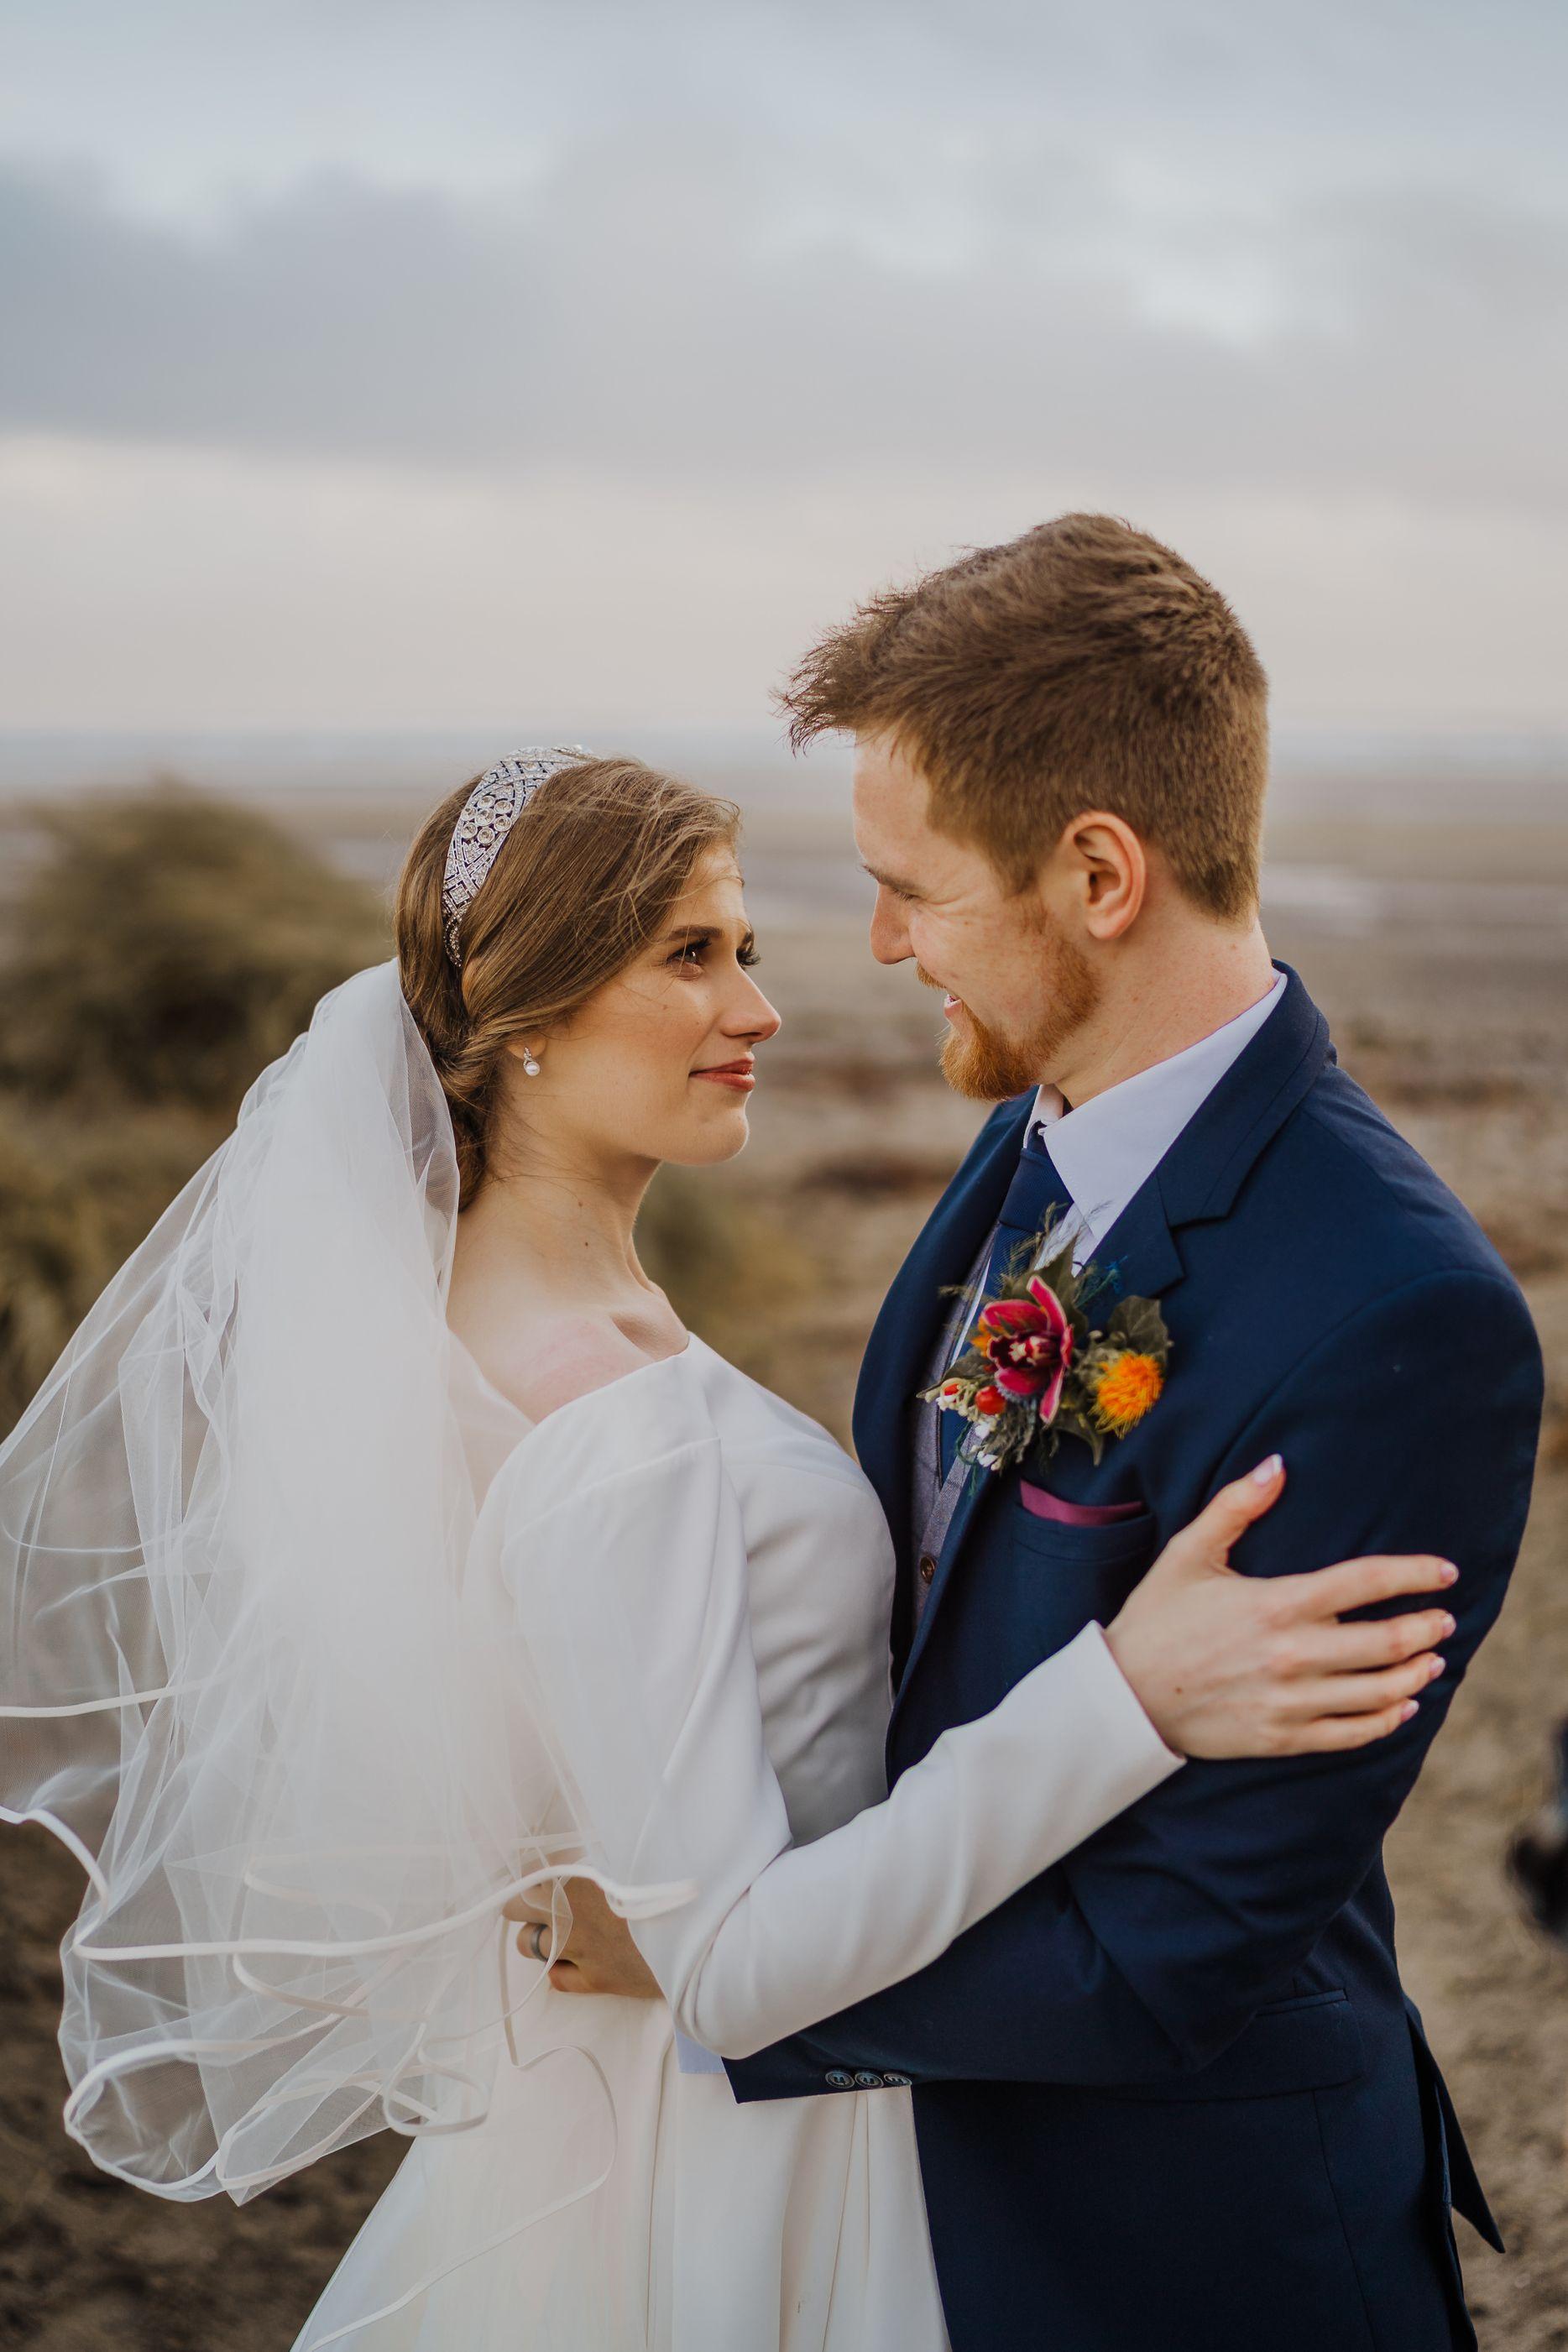 tiffany gage photography tiffany gage wedding photograper northern ireland 40025